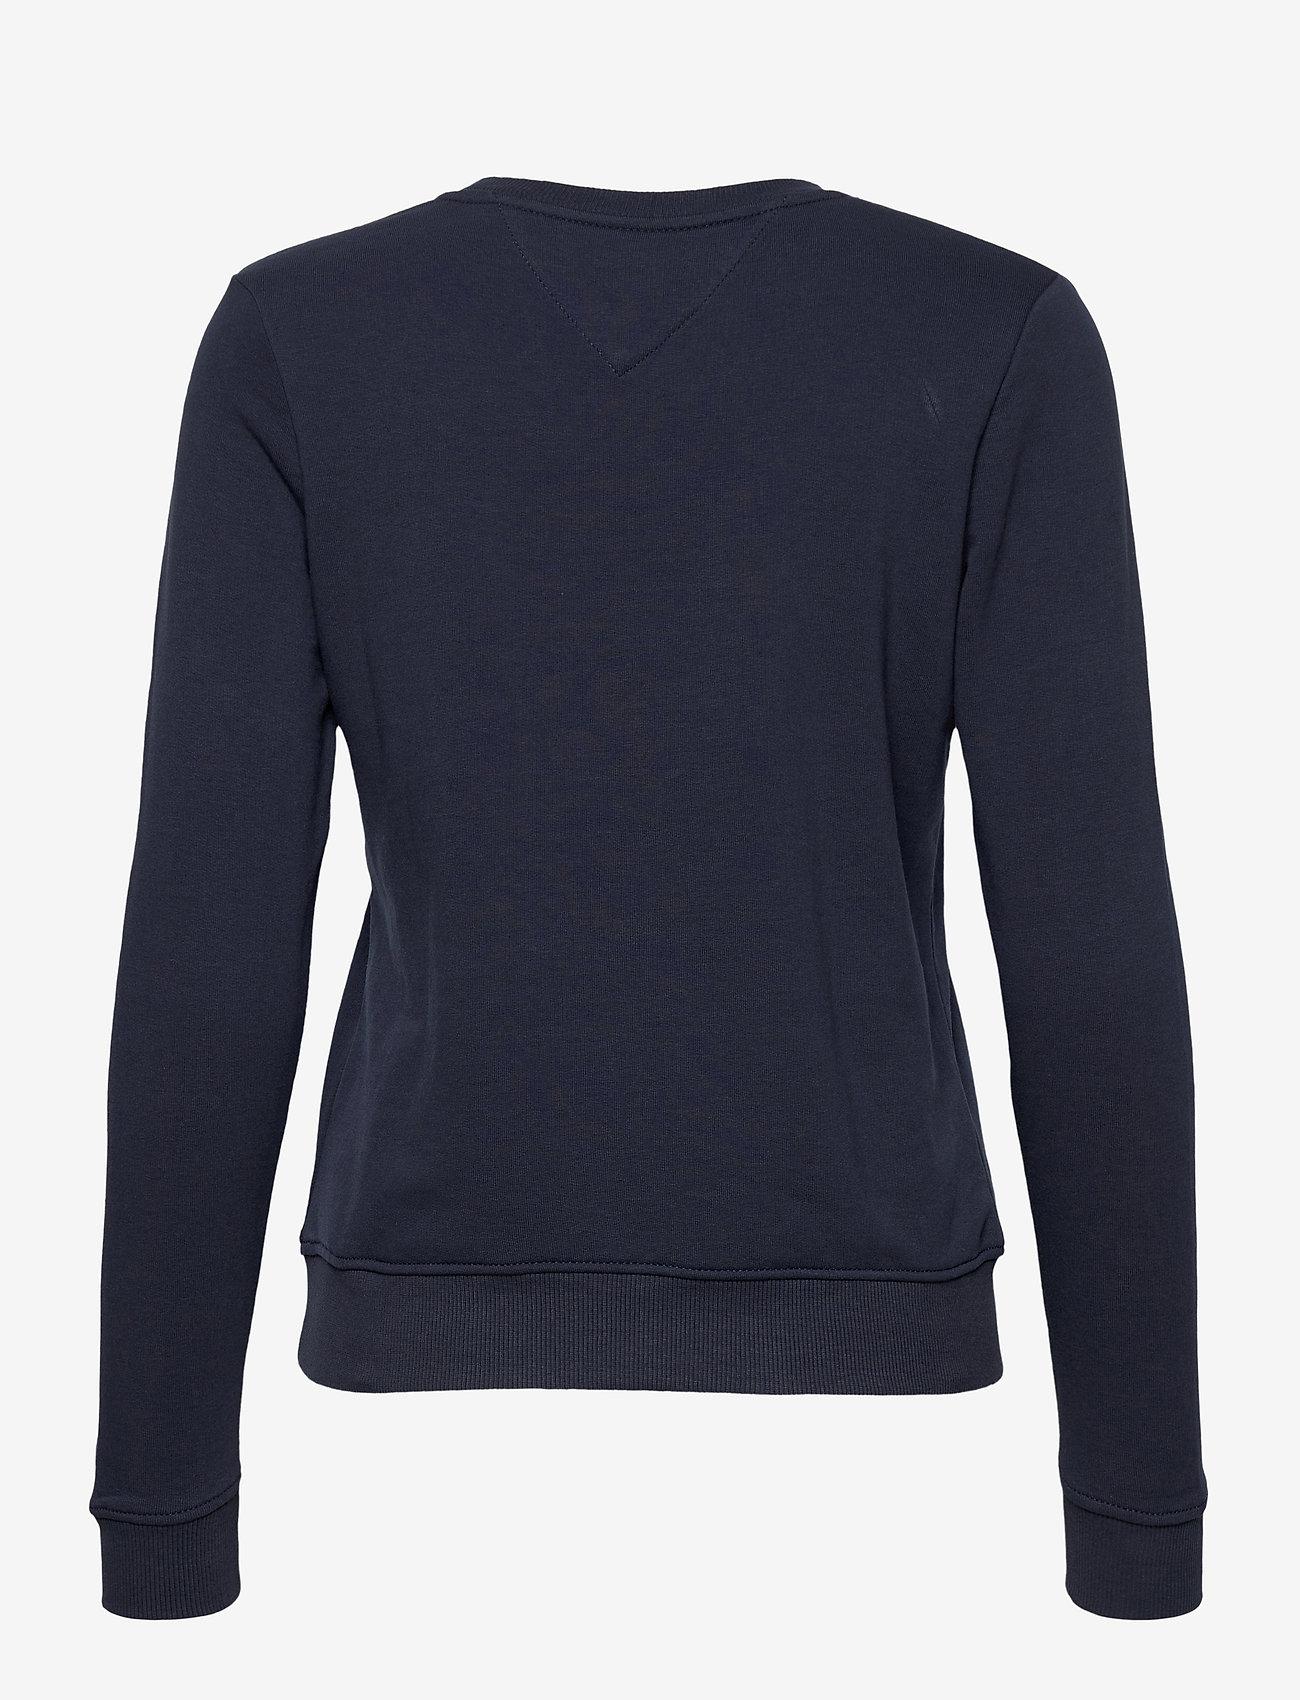 Tommy Jeans - TJW REGULAR ESSENTIAL LOGO - sweatshirts & hoodies - twilight navy - 1